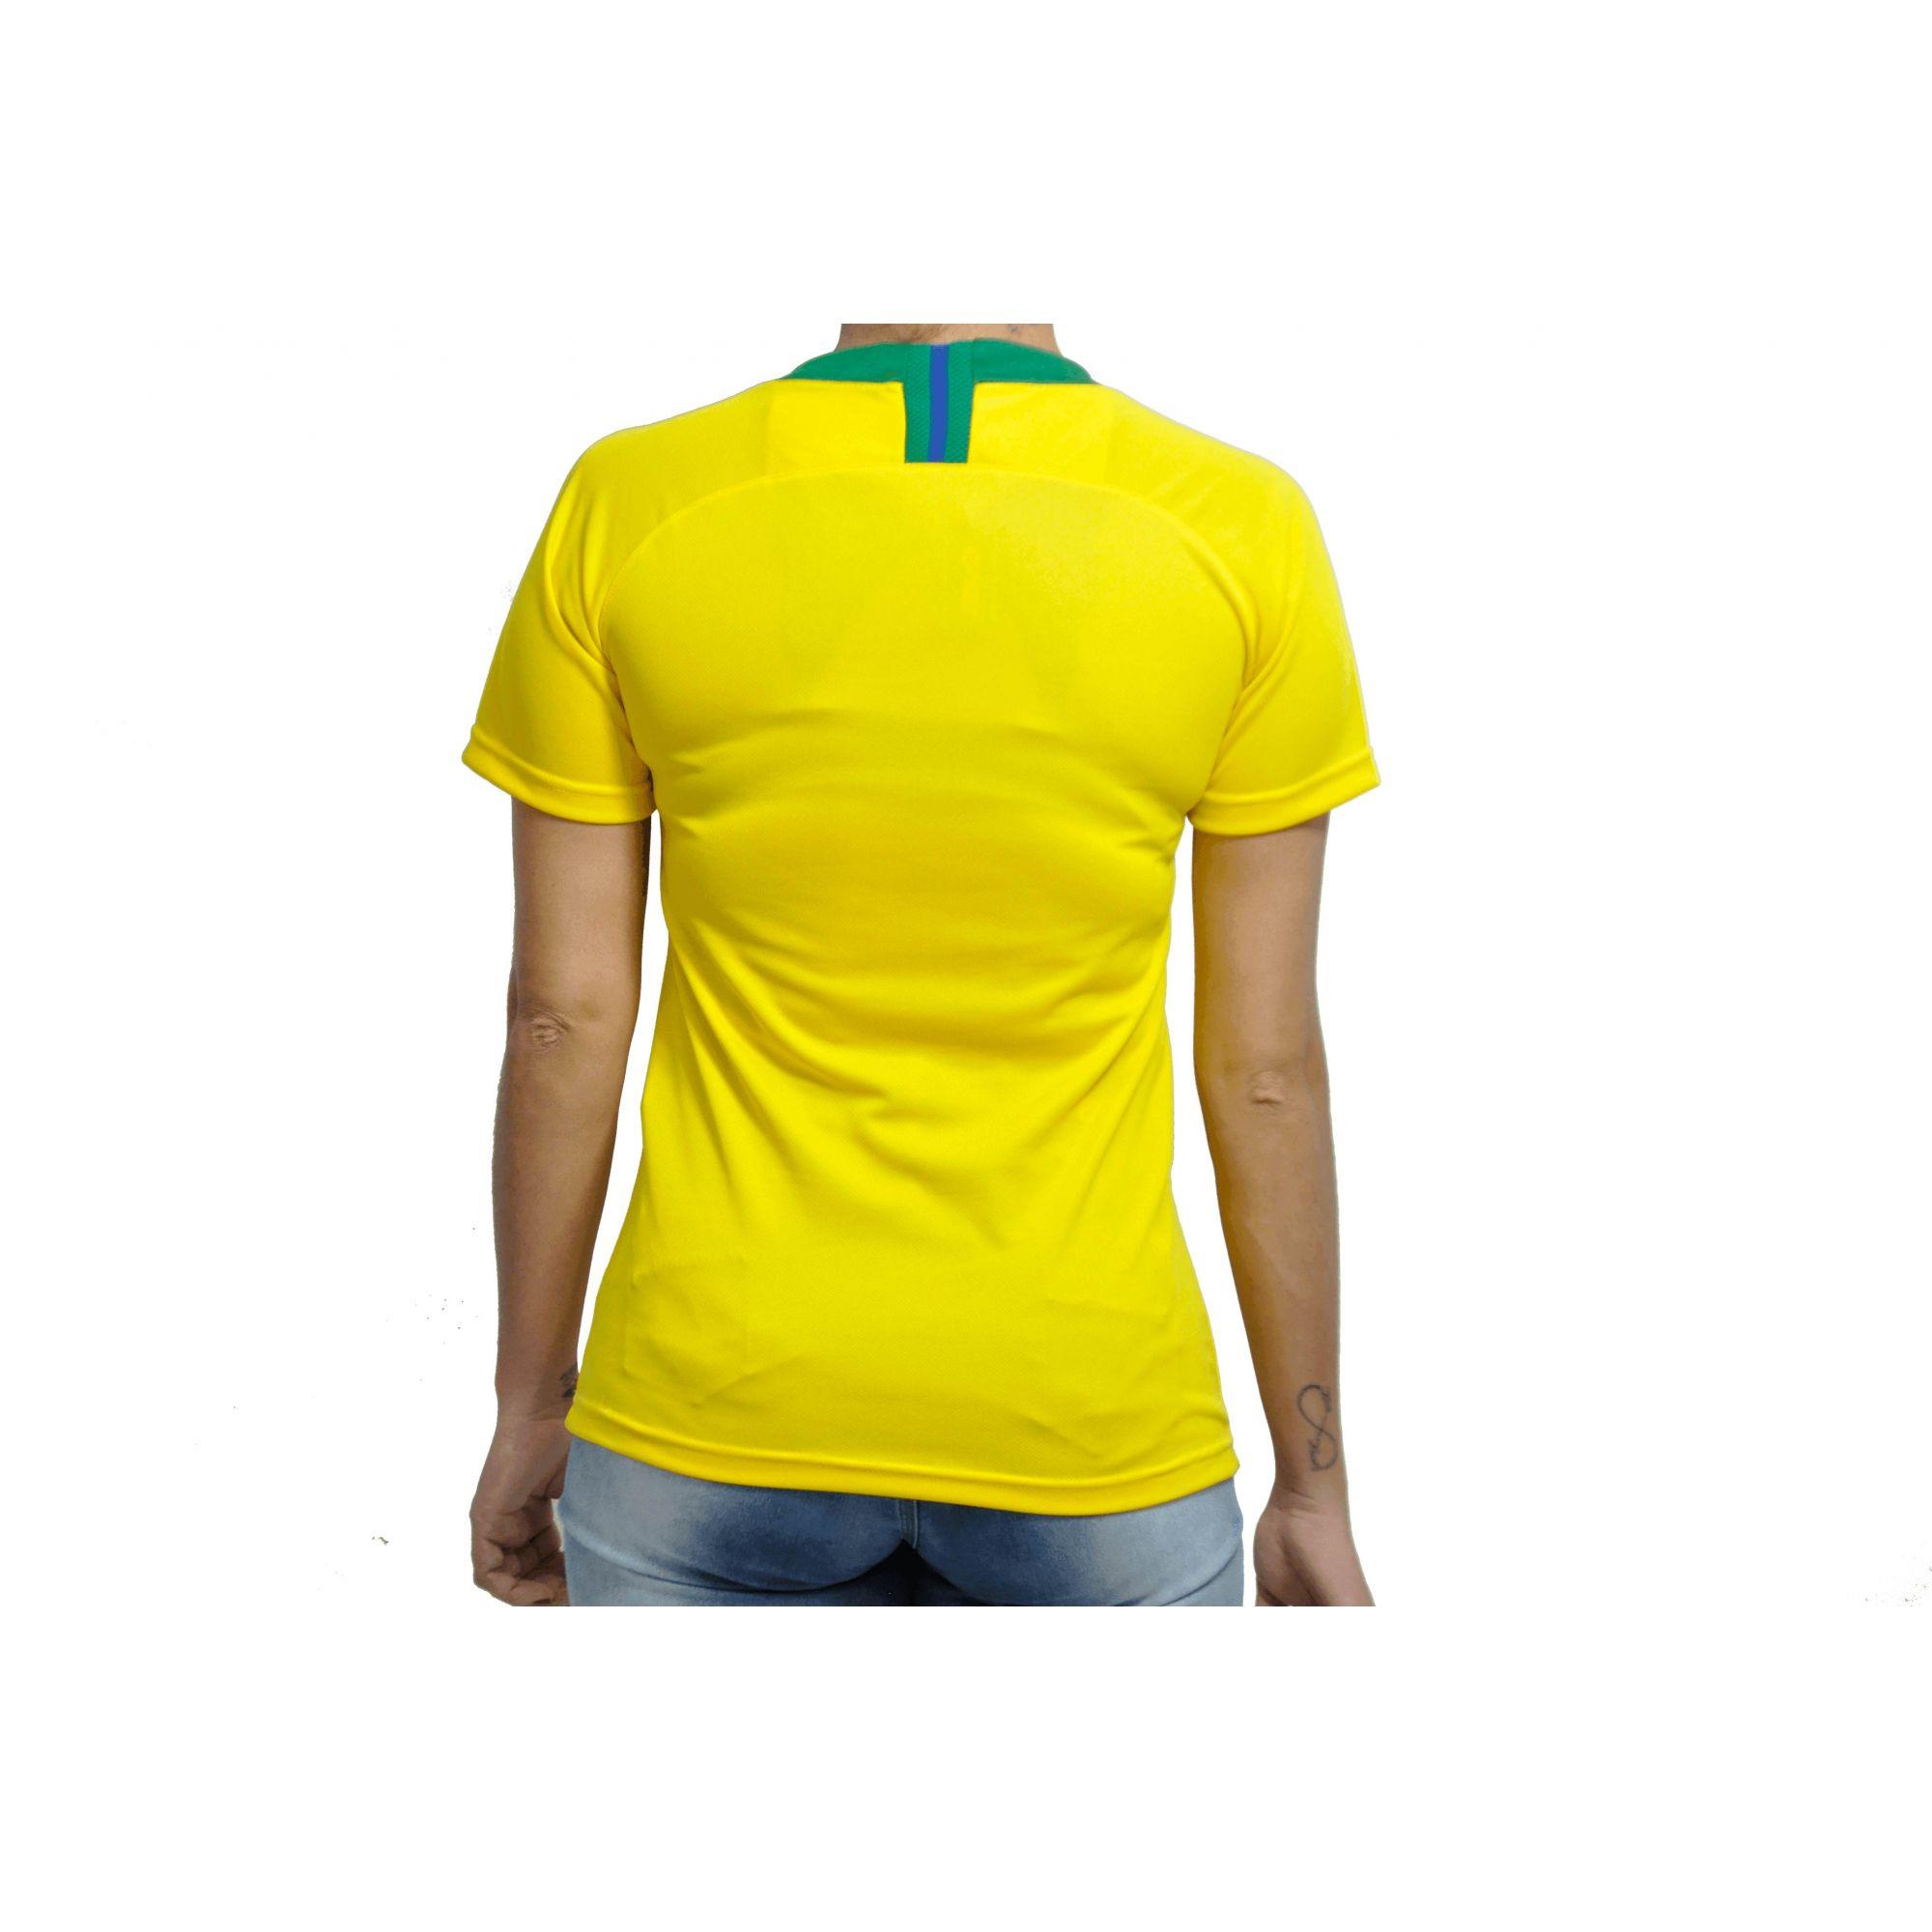 4fcfdff935 Camisa Brasil Seleção Brasileira 2018 Baby Look - Feminino - BRACIA ...